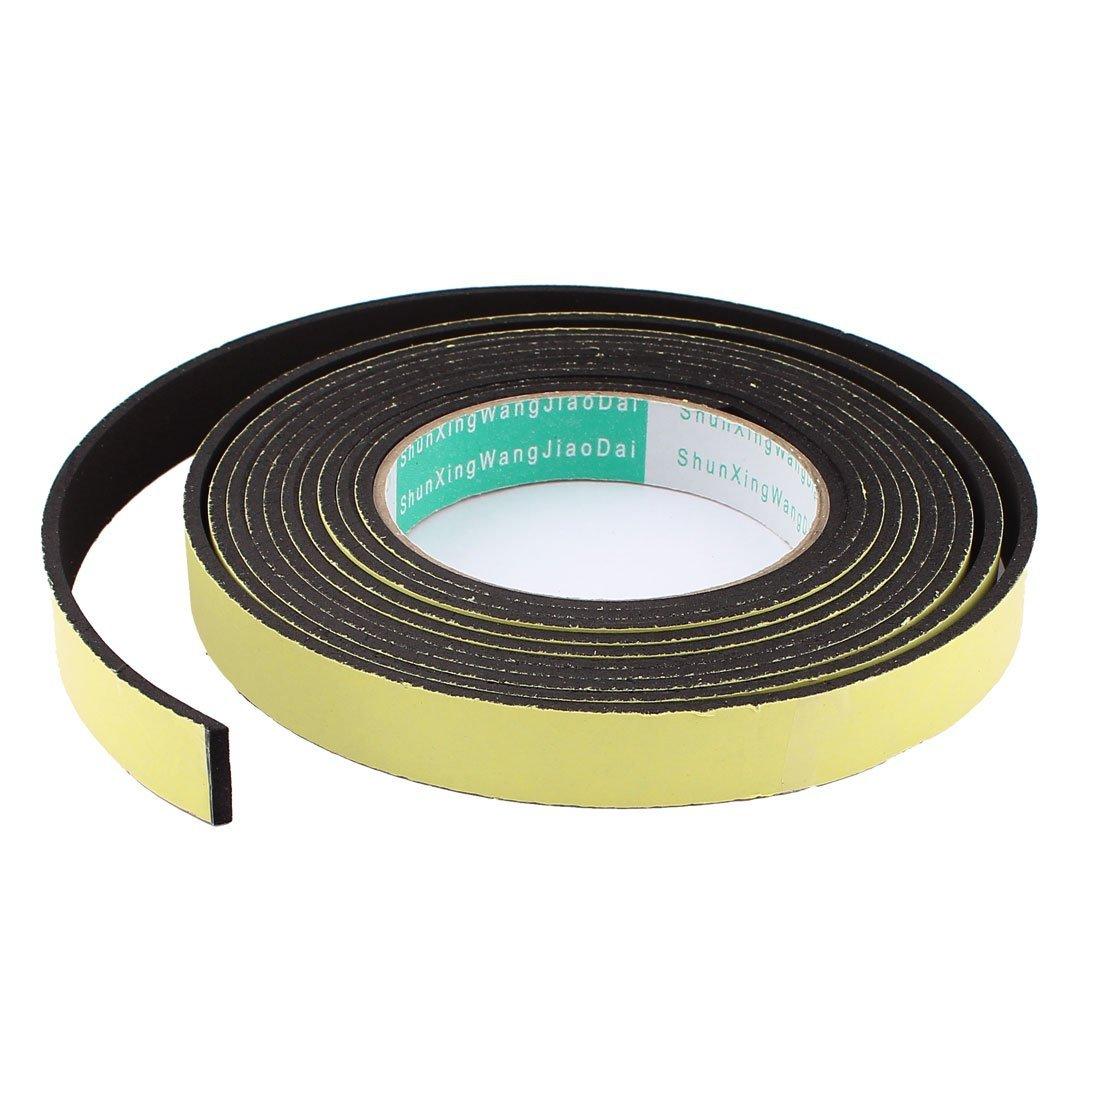 4M 18mm x 3mm Single Side Adhesive Foam Sealing Tape for Door Window DealMux DLM-B016VR6G2G